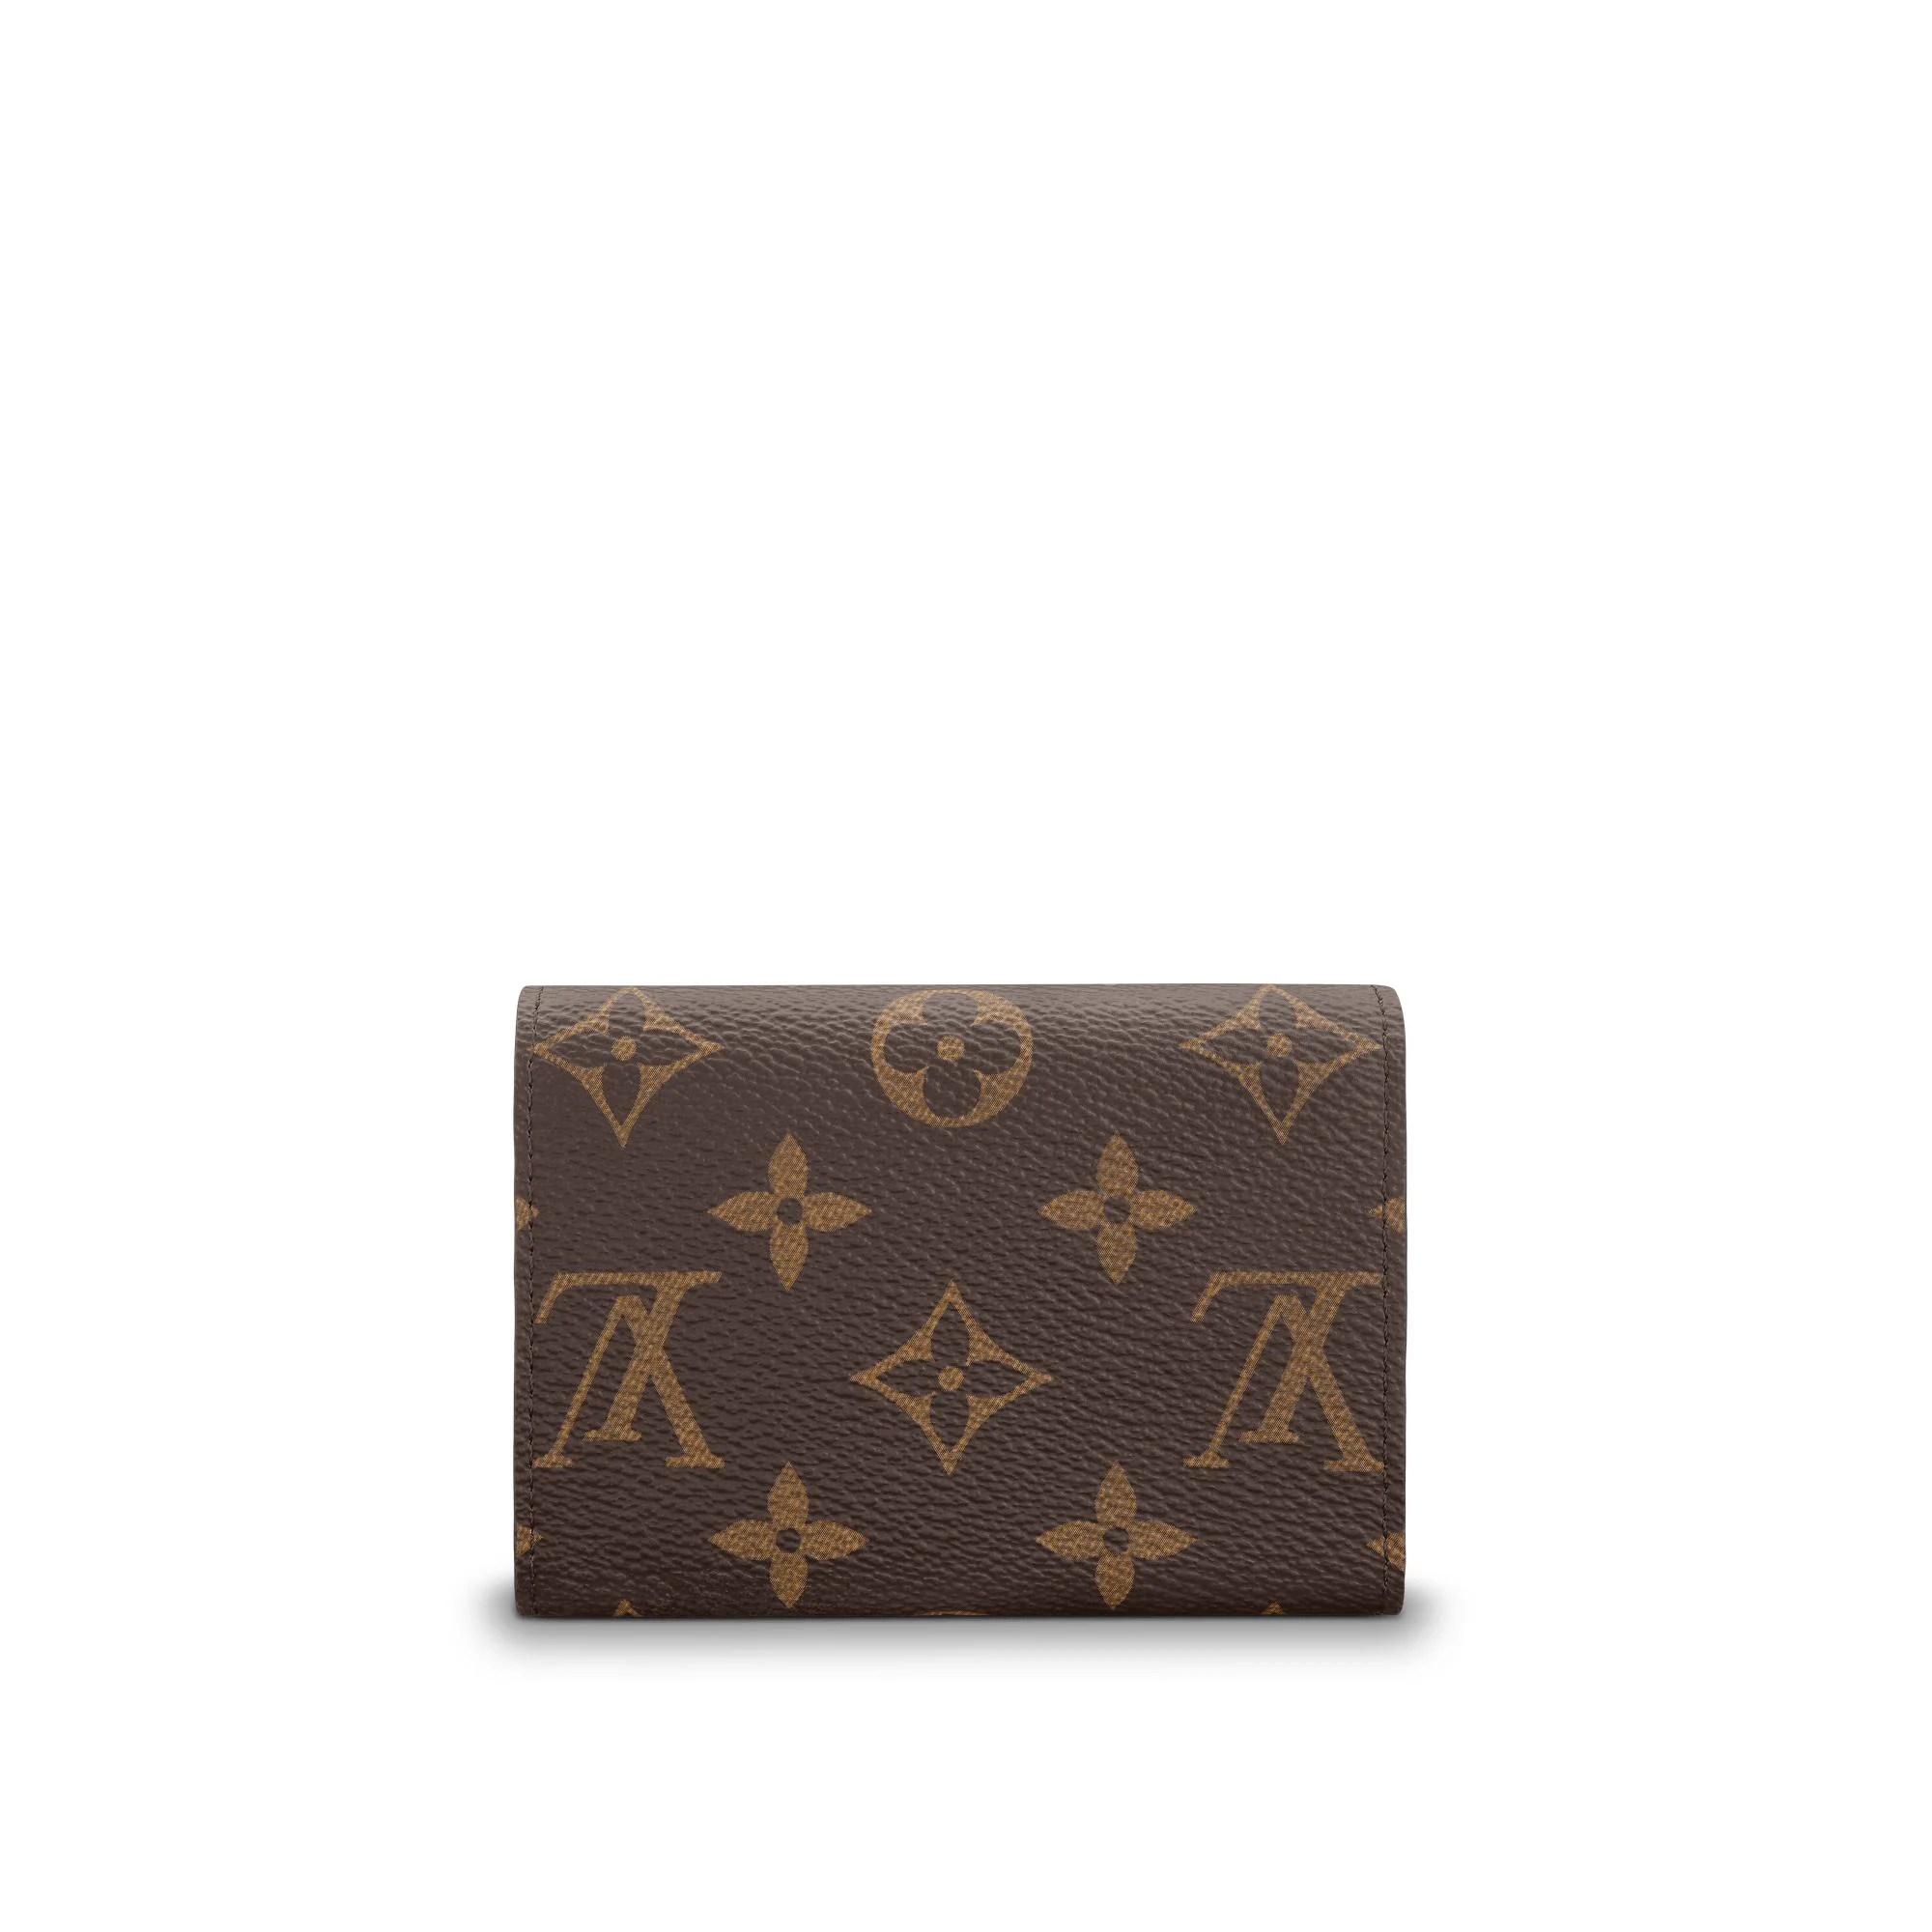 Rosalie Coin Purse Monogram Canvas  Small Leather Goods  LOUIS VUITTON